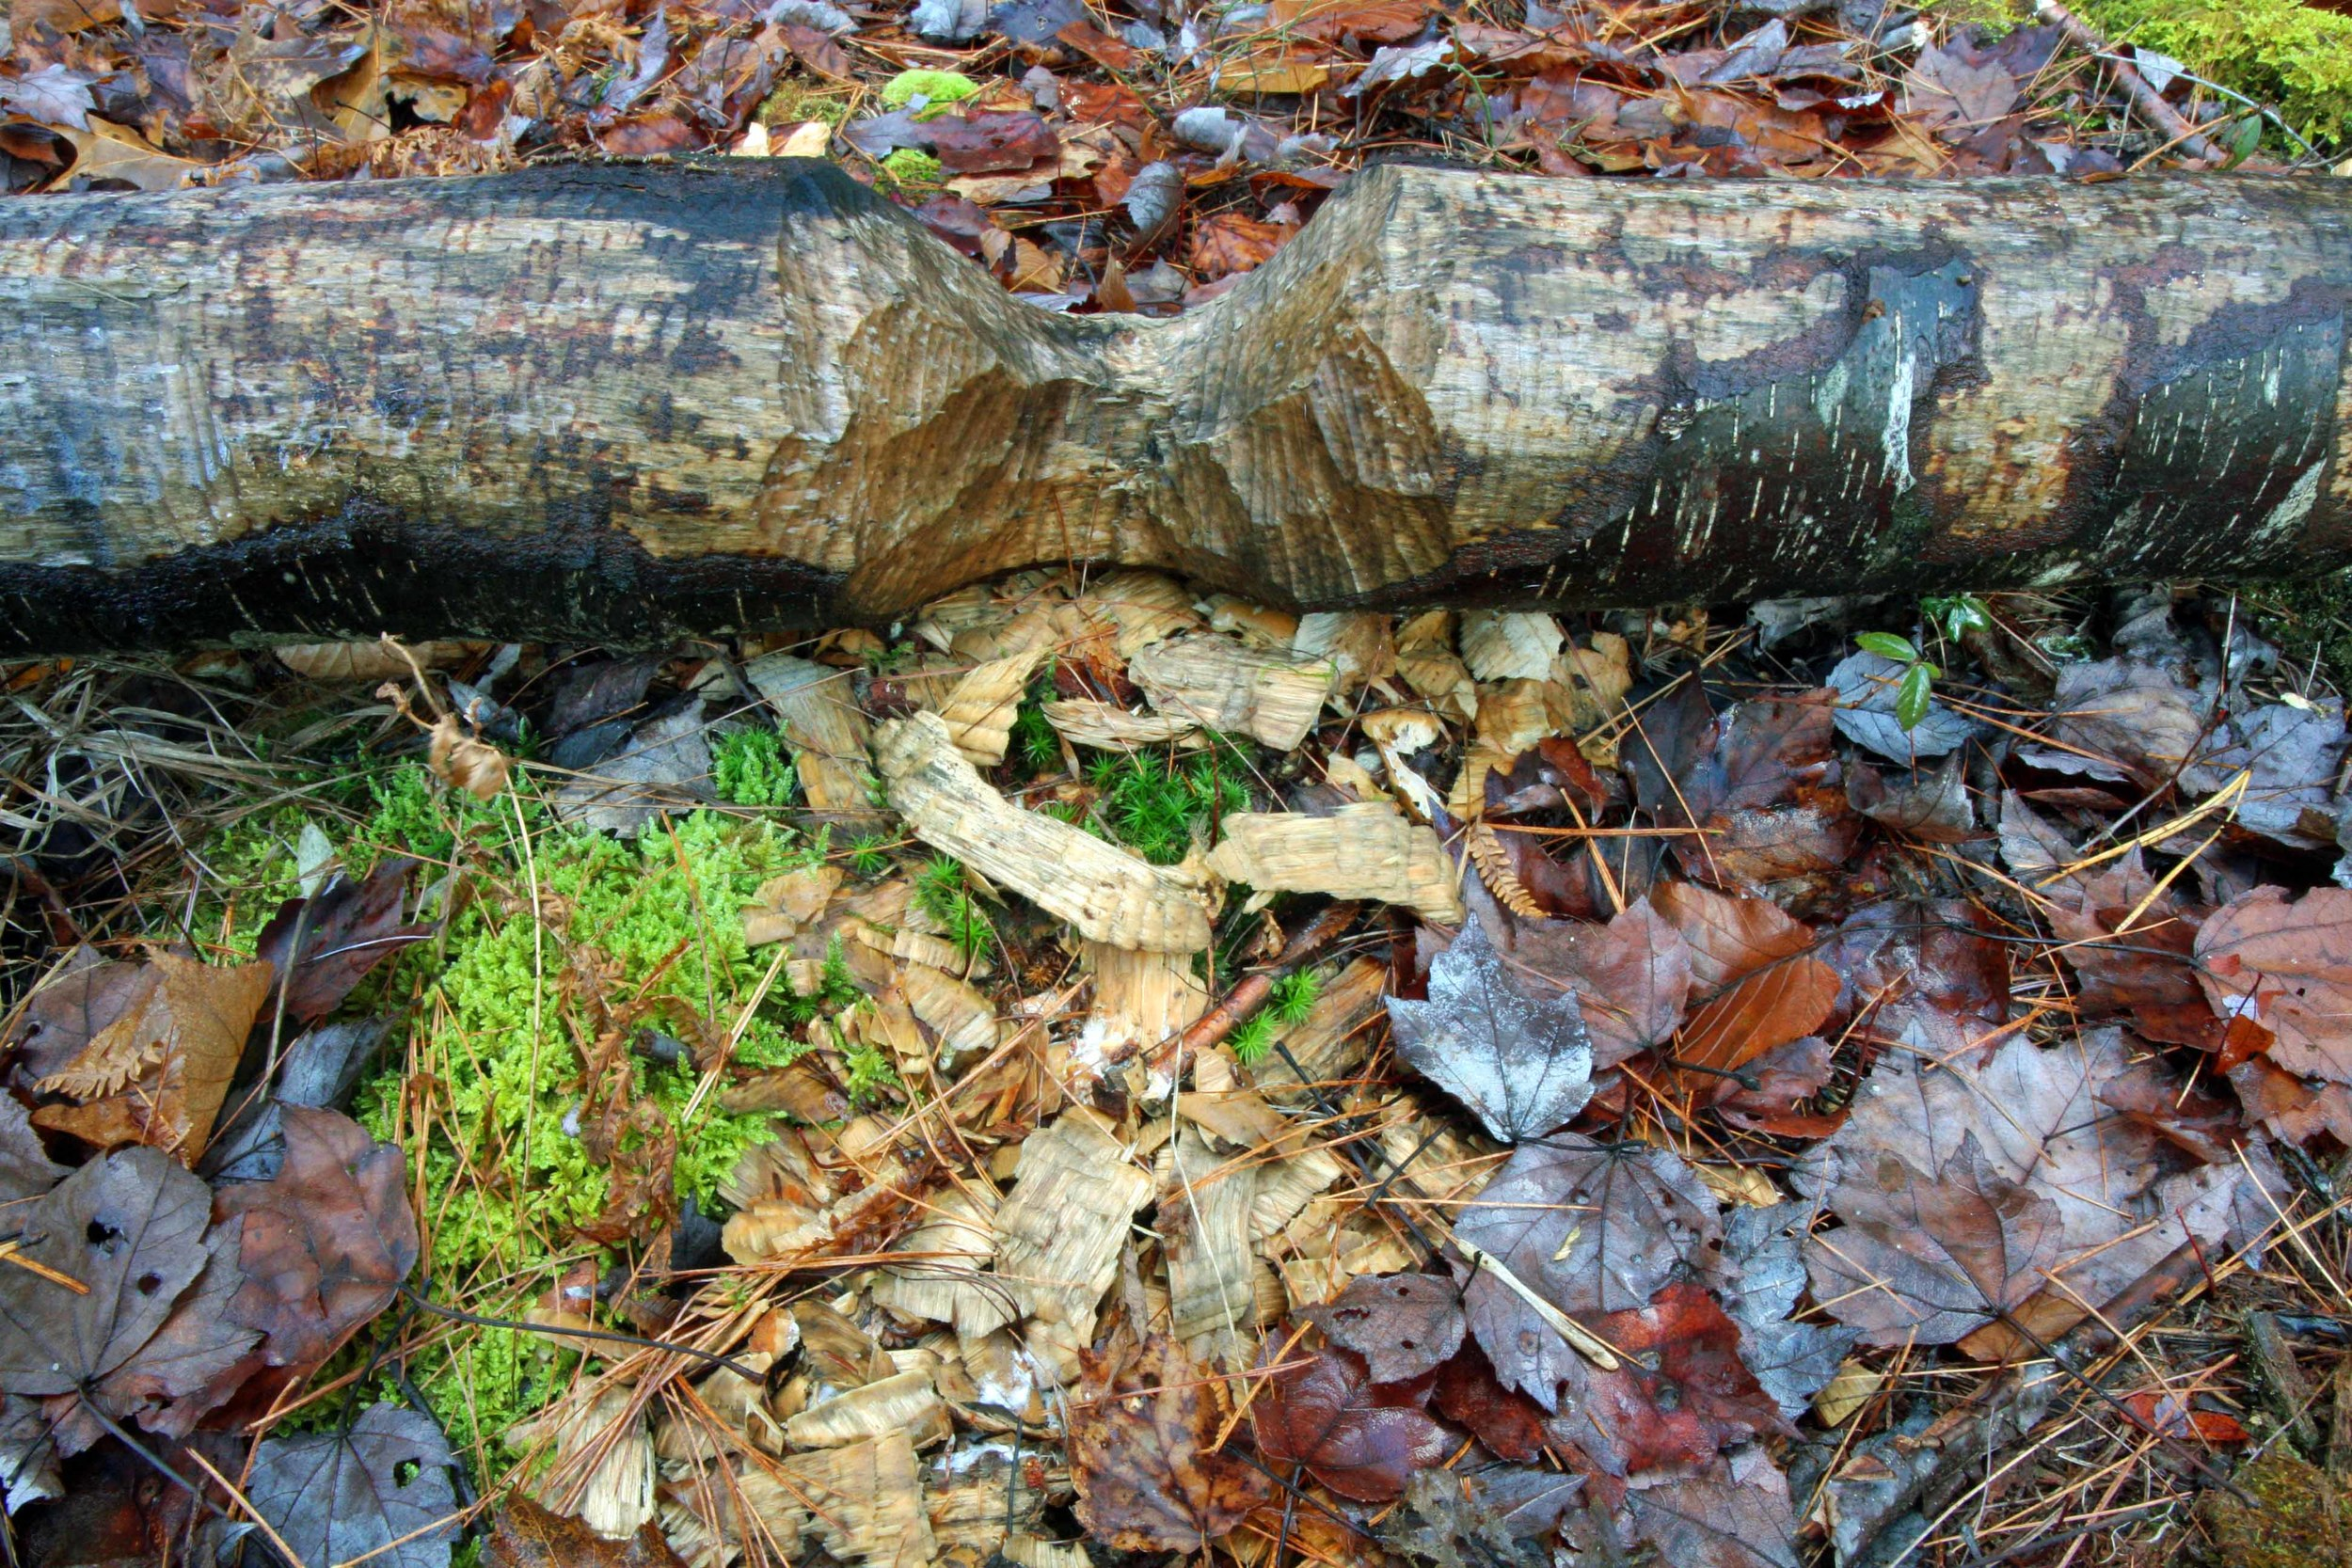 A beaver-gnawed log